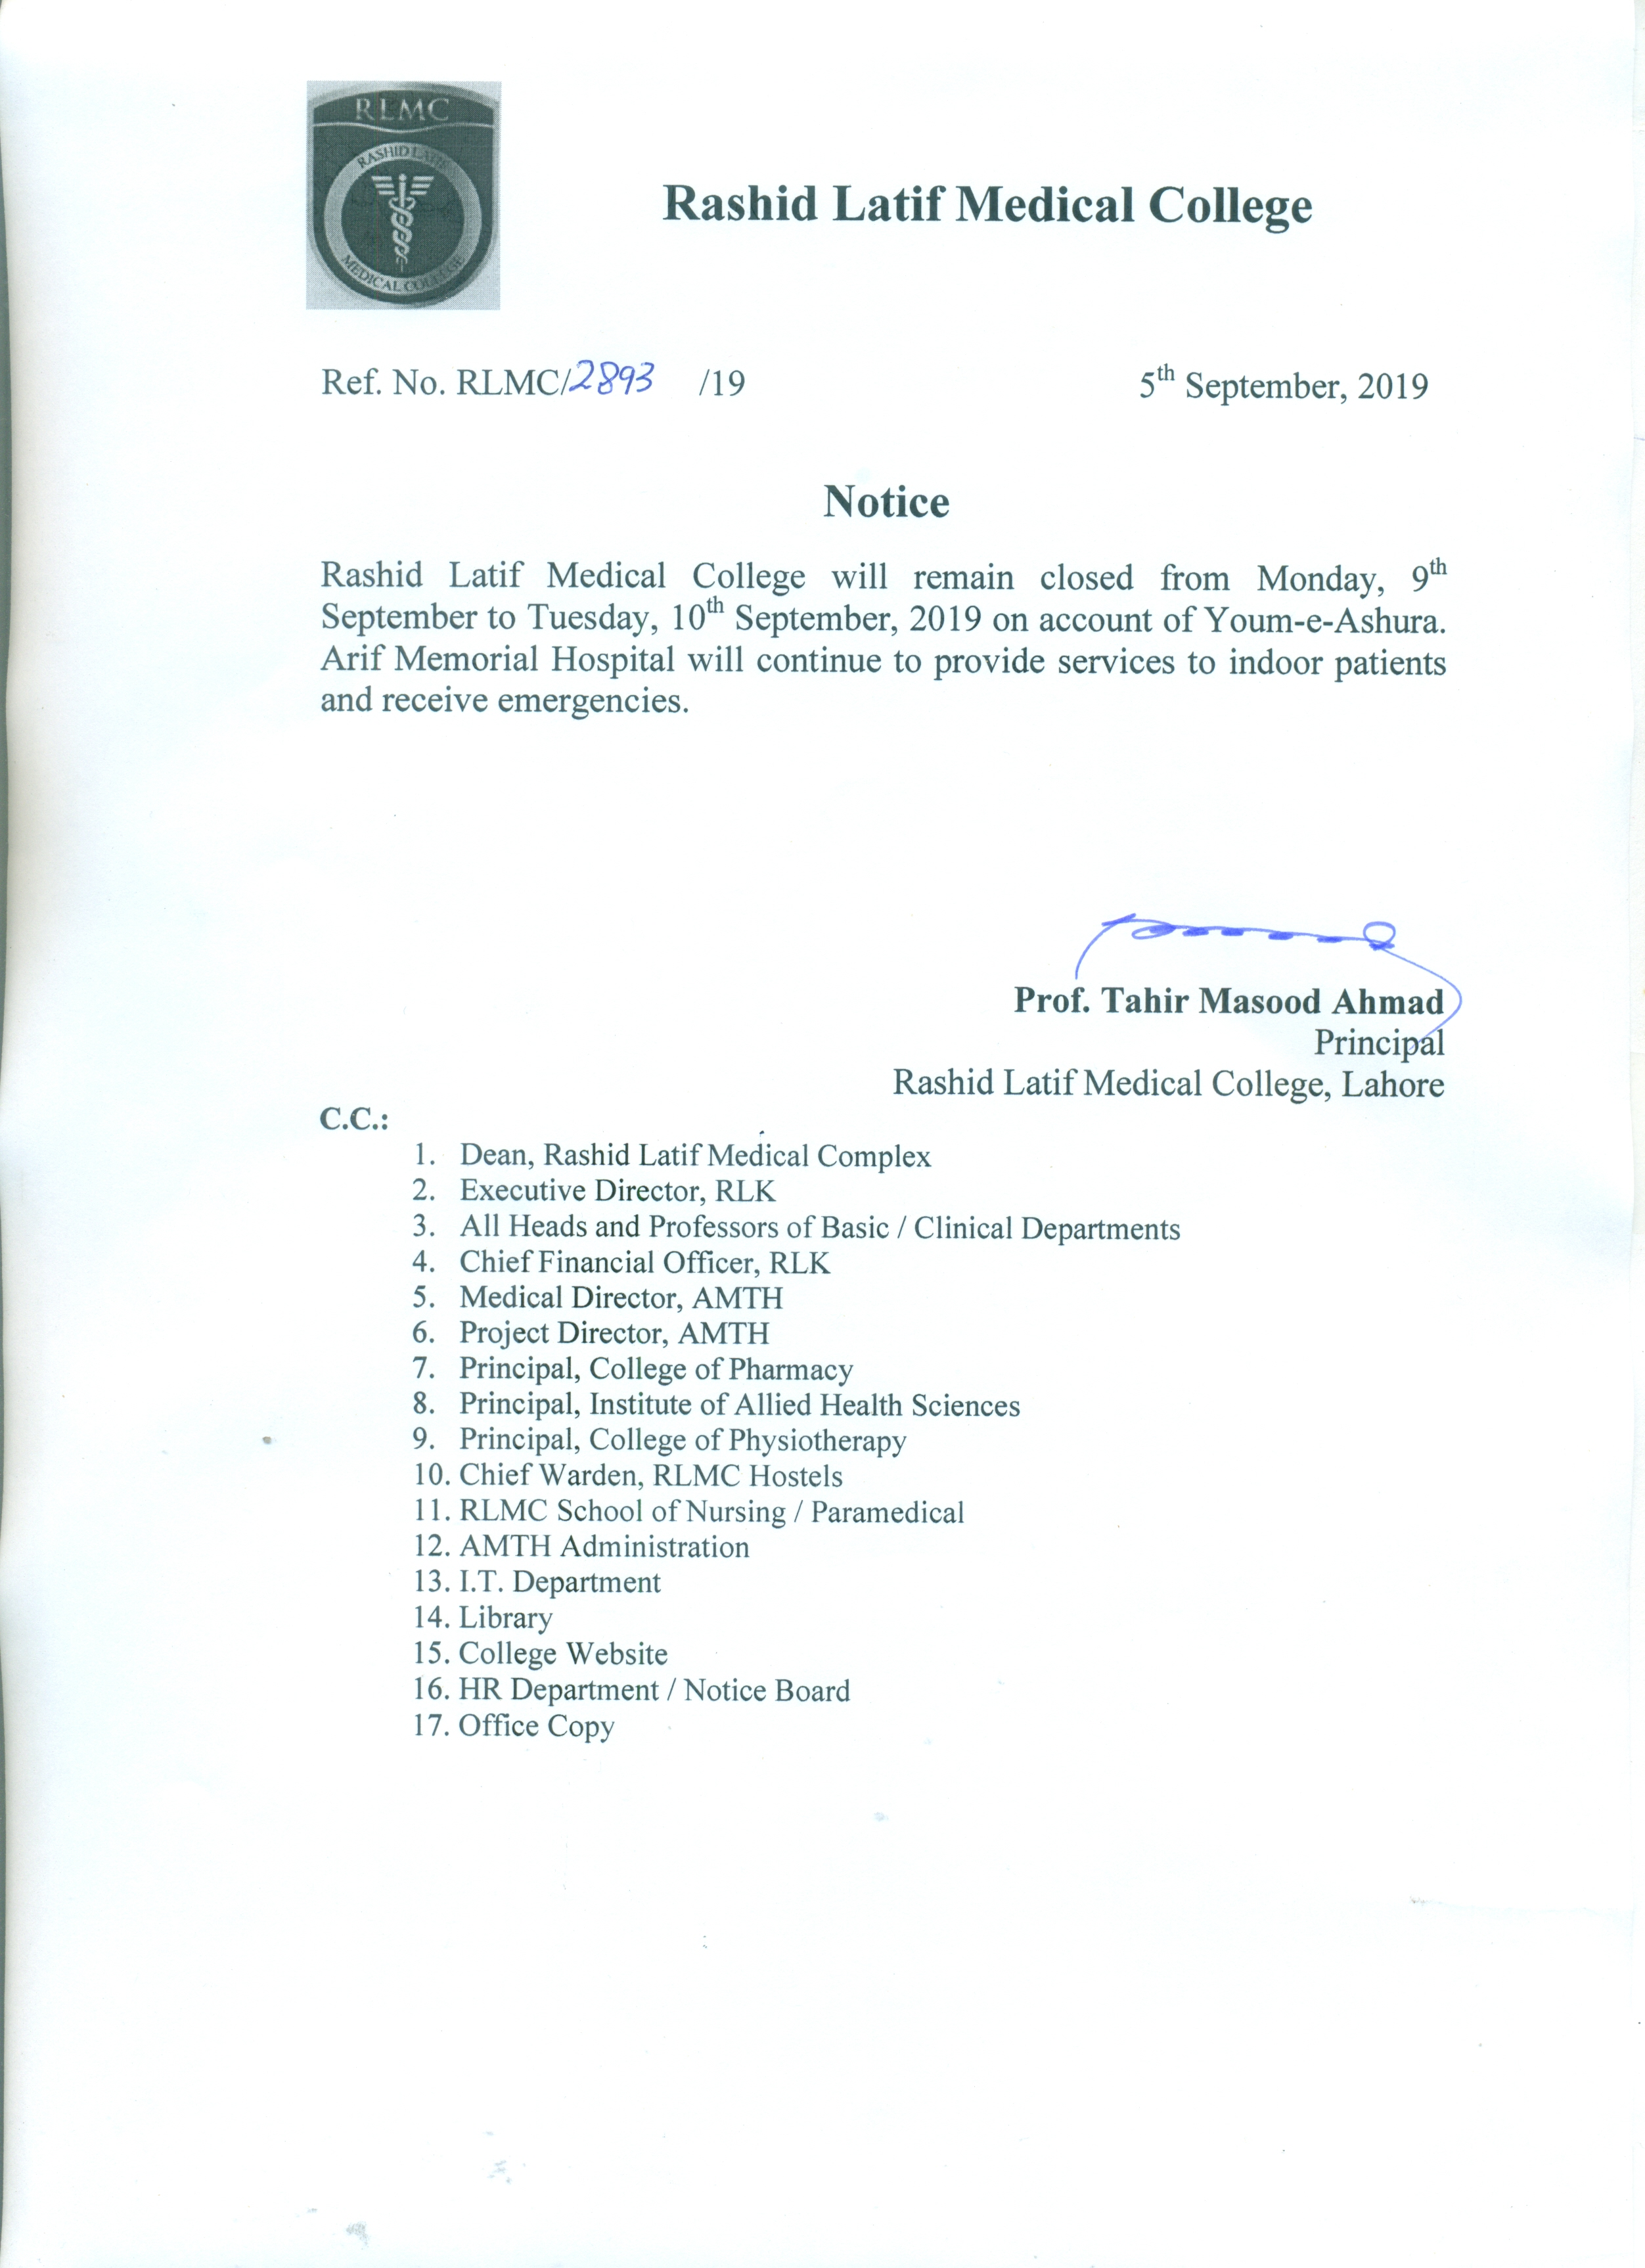 RLMC-Rashid Latif Medical College